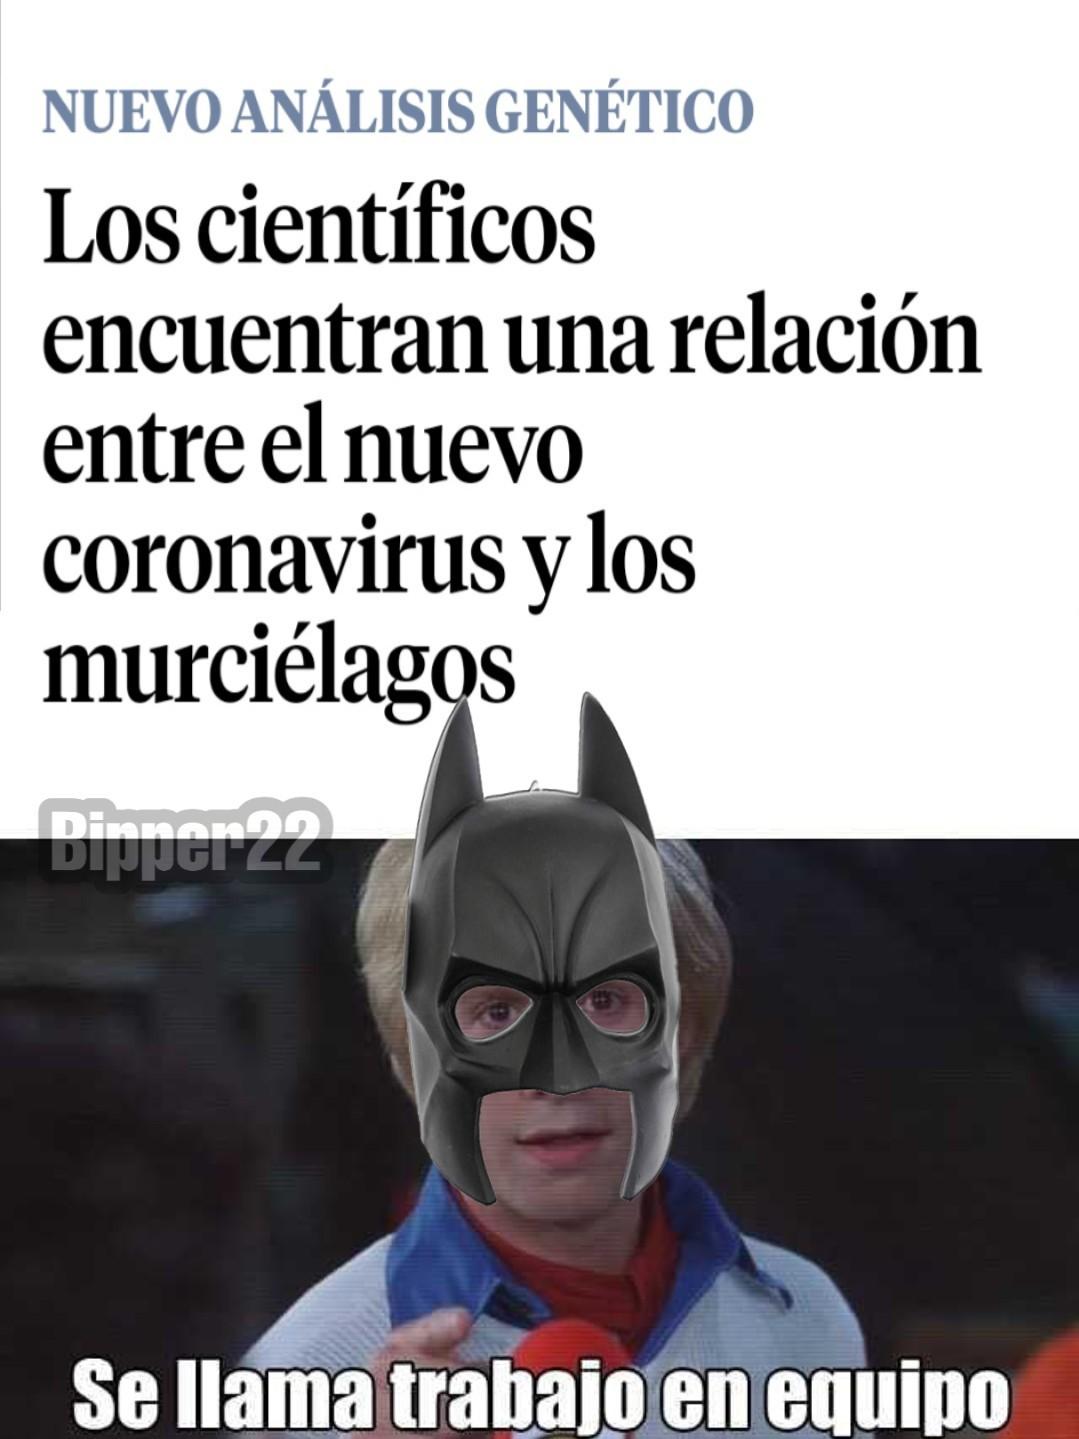 Maldito Batman - meme